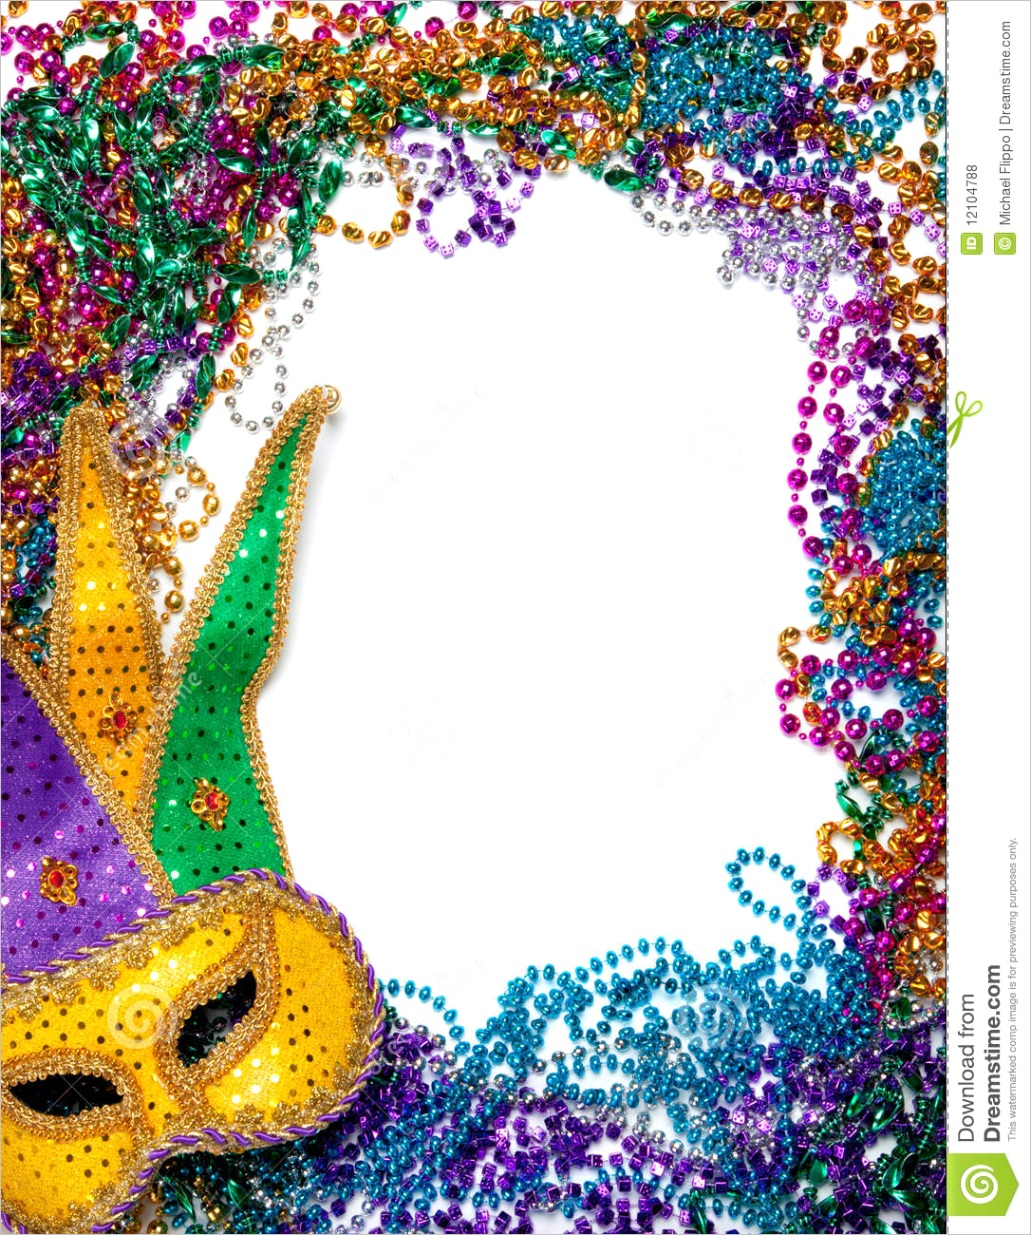 royalty free stock photos border made mardi gras bead mask white image